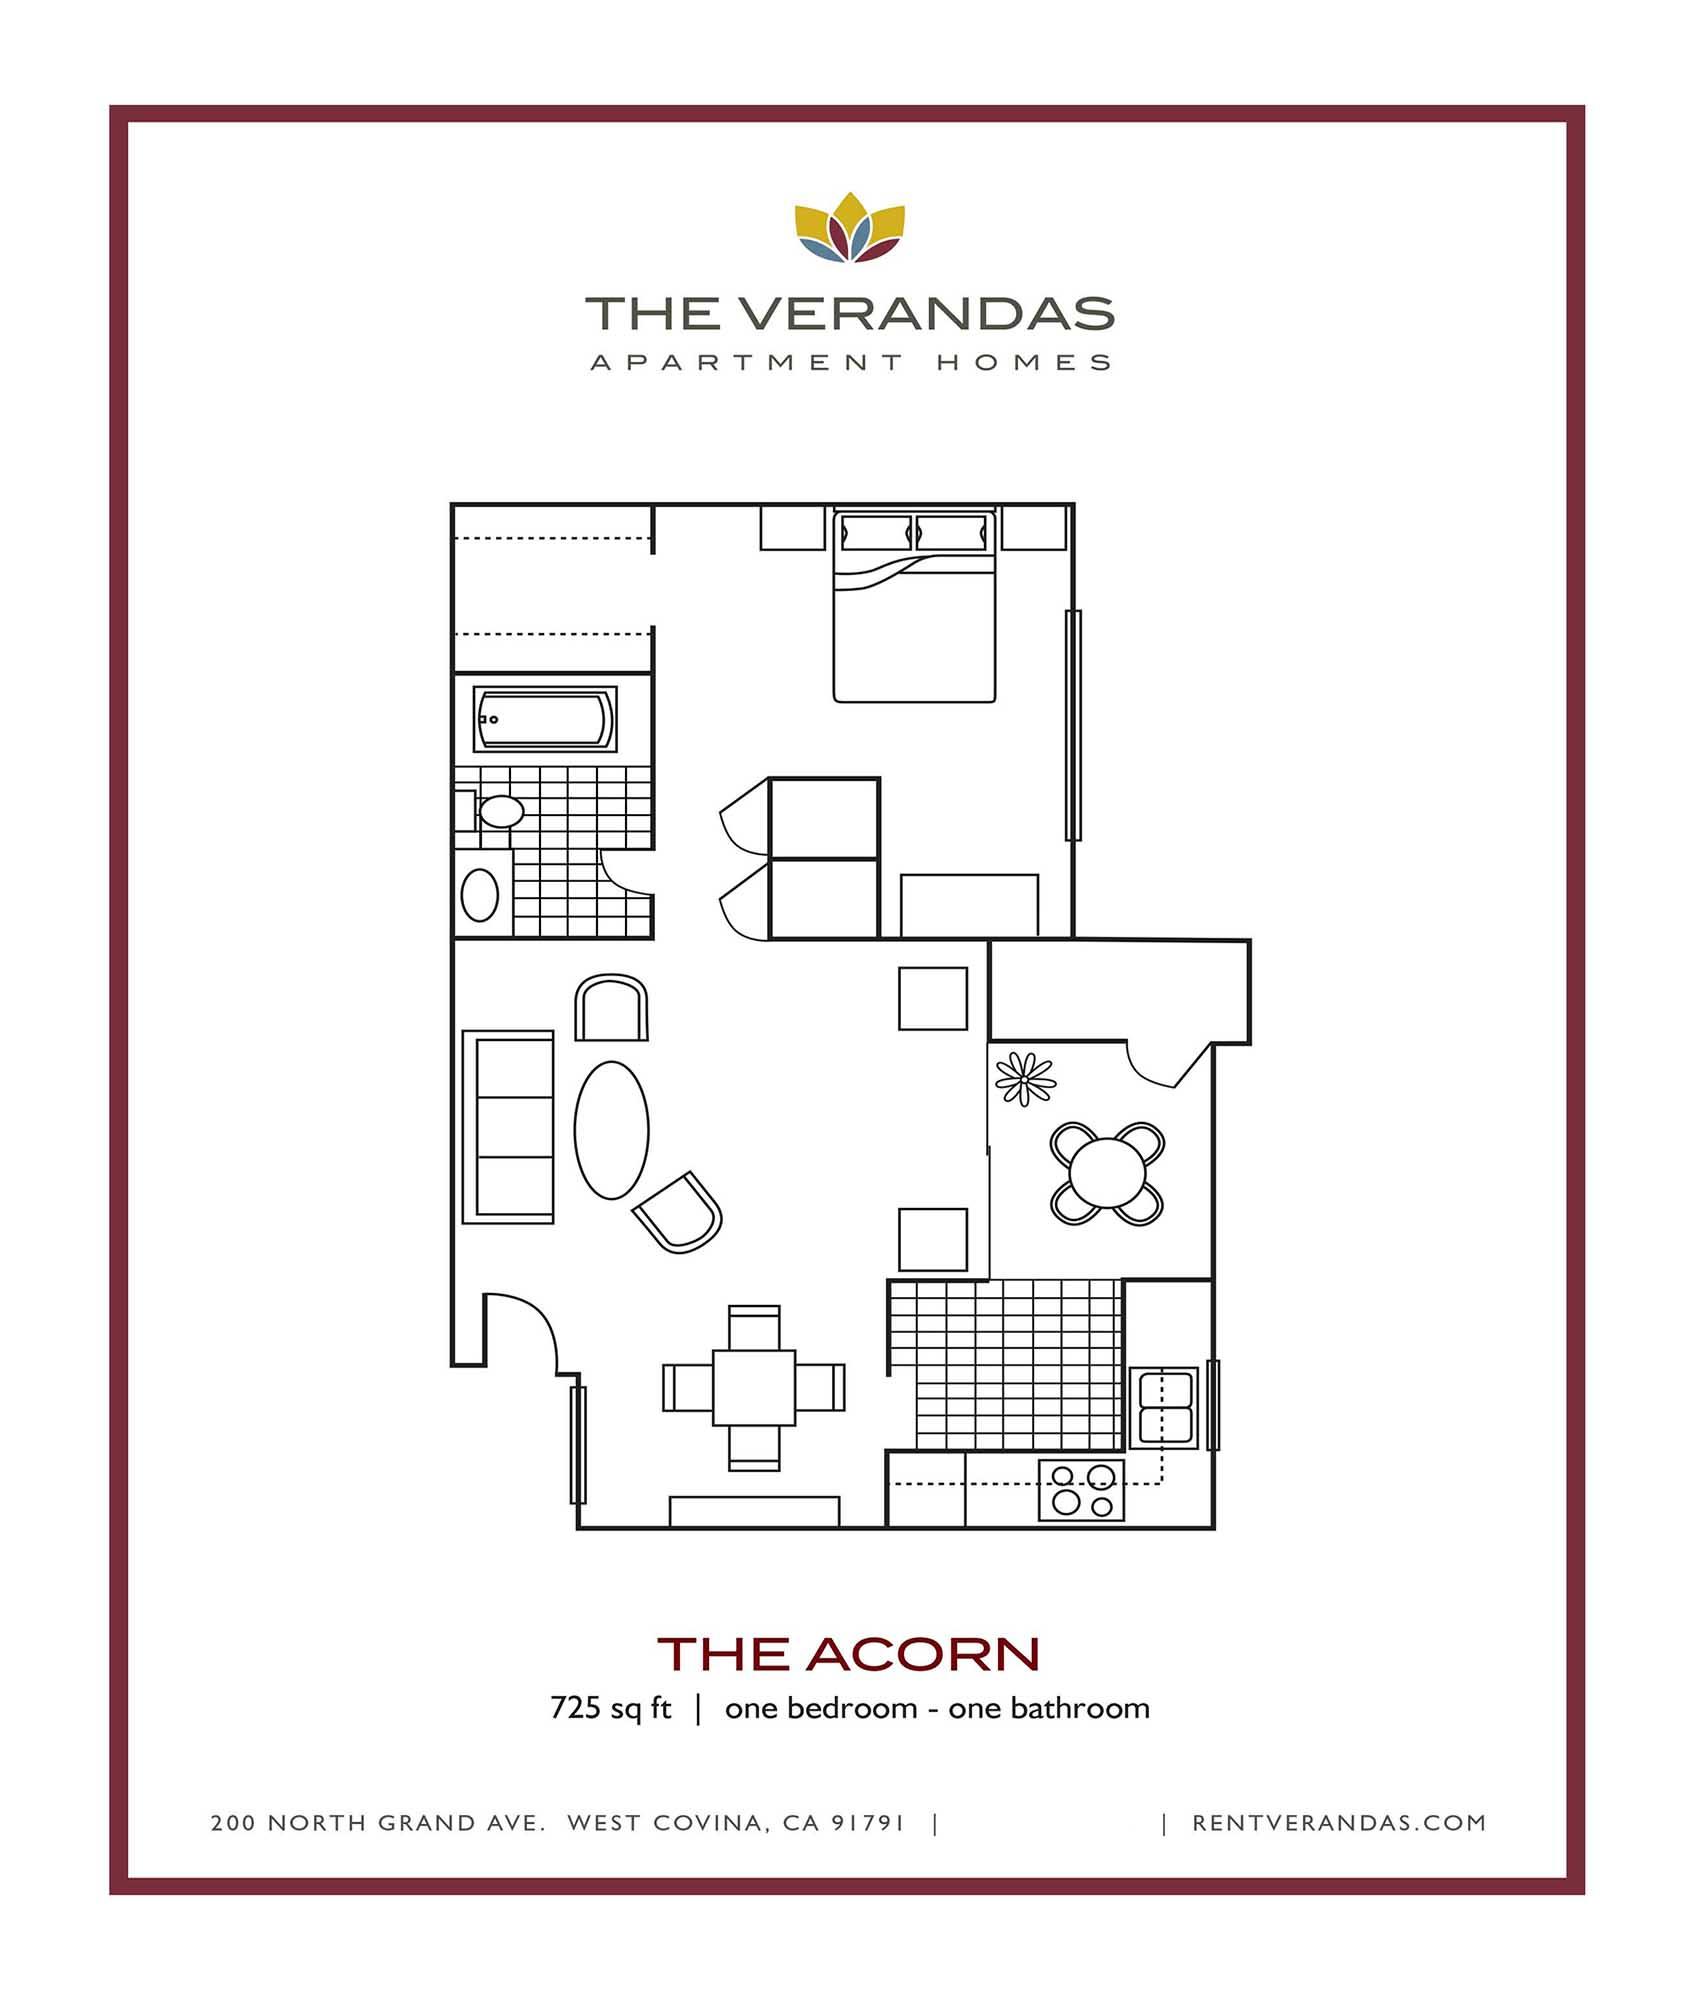 Apartments in West Covina, CA | The Verandas | Floor Plans on one bedroom home, bath townhouse floor plan, luxury townhouse floor plan, six bedroom townhouse floor plan, one kitchen floor plan,